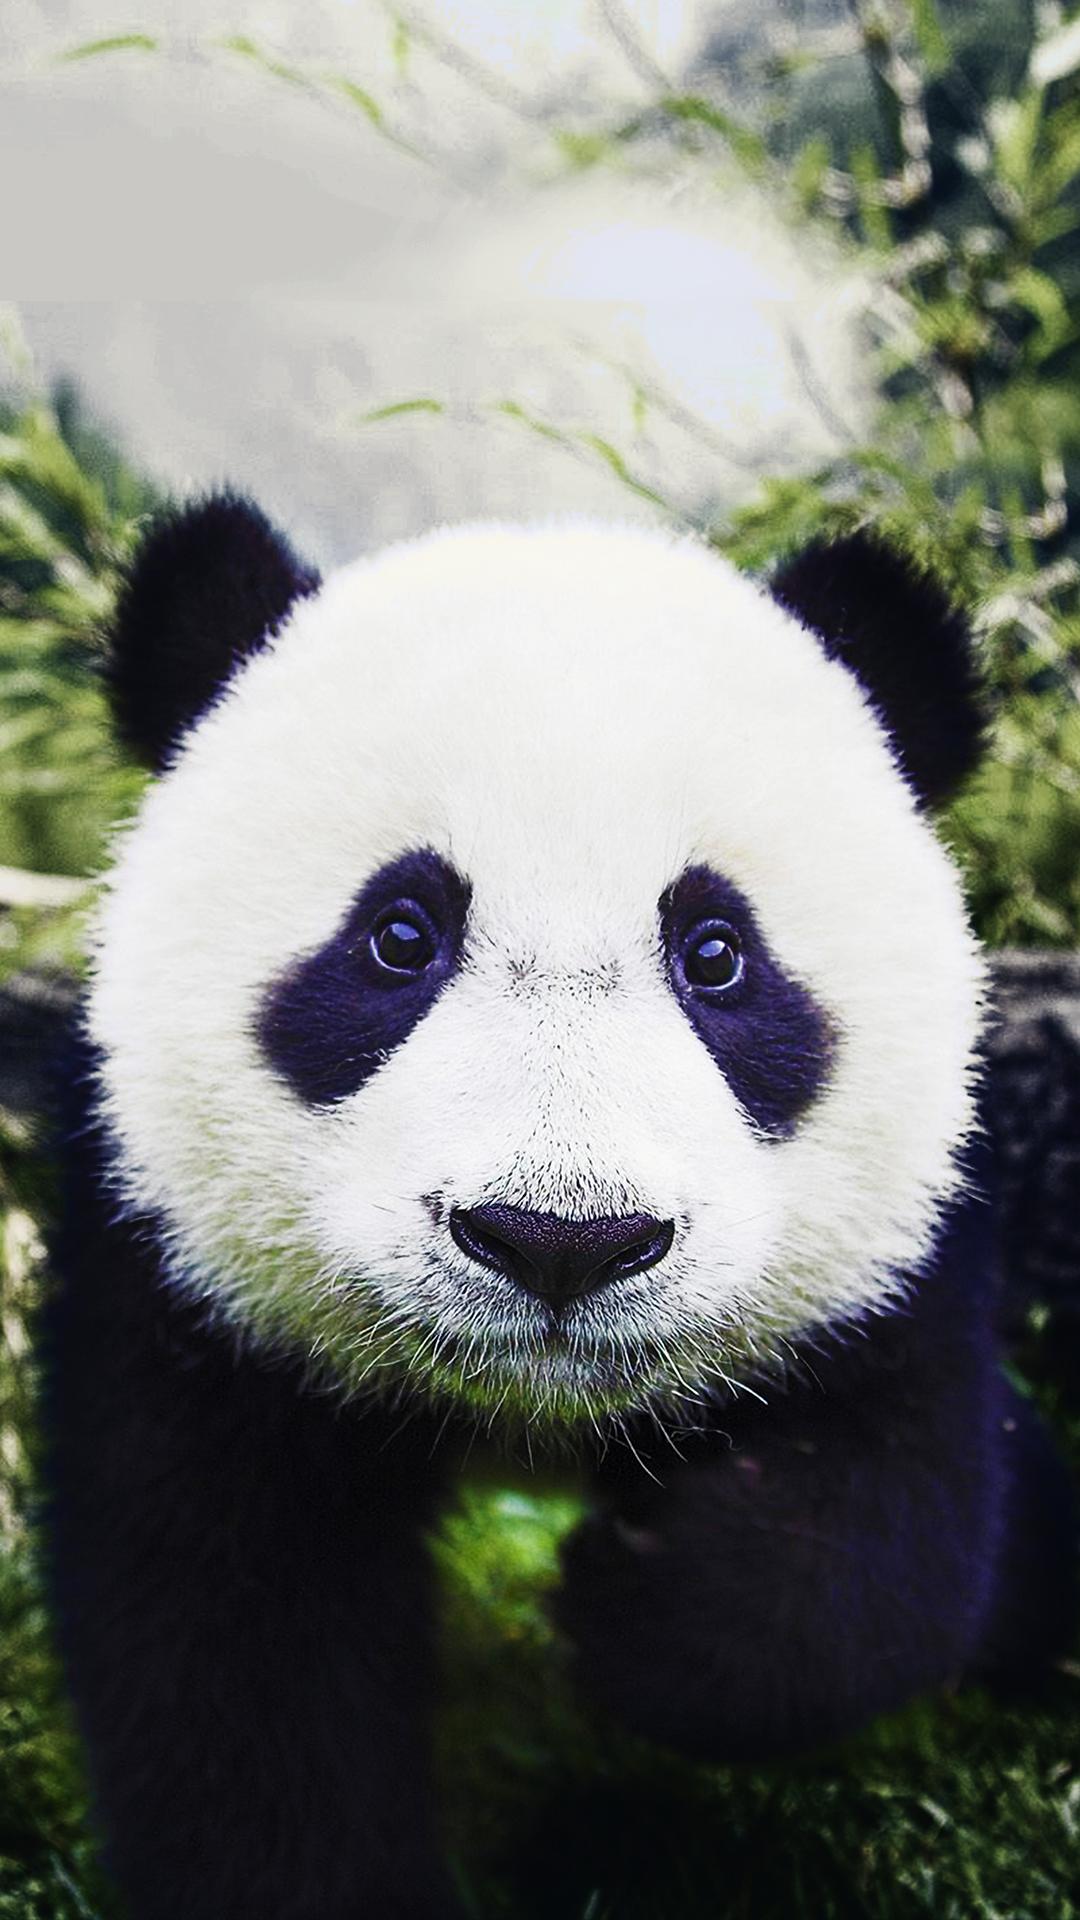 Cute Crisp Wallpapers Free Hd Baby Panda Phone Wallpaper 6851